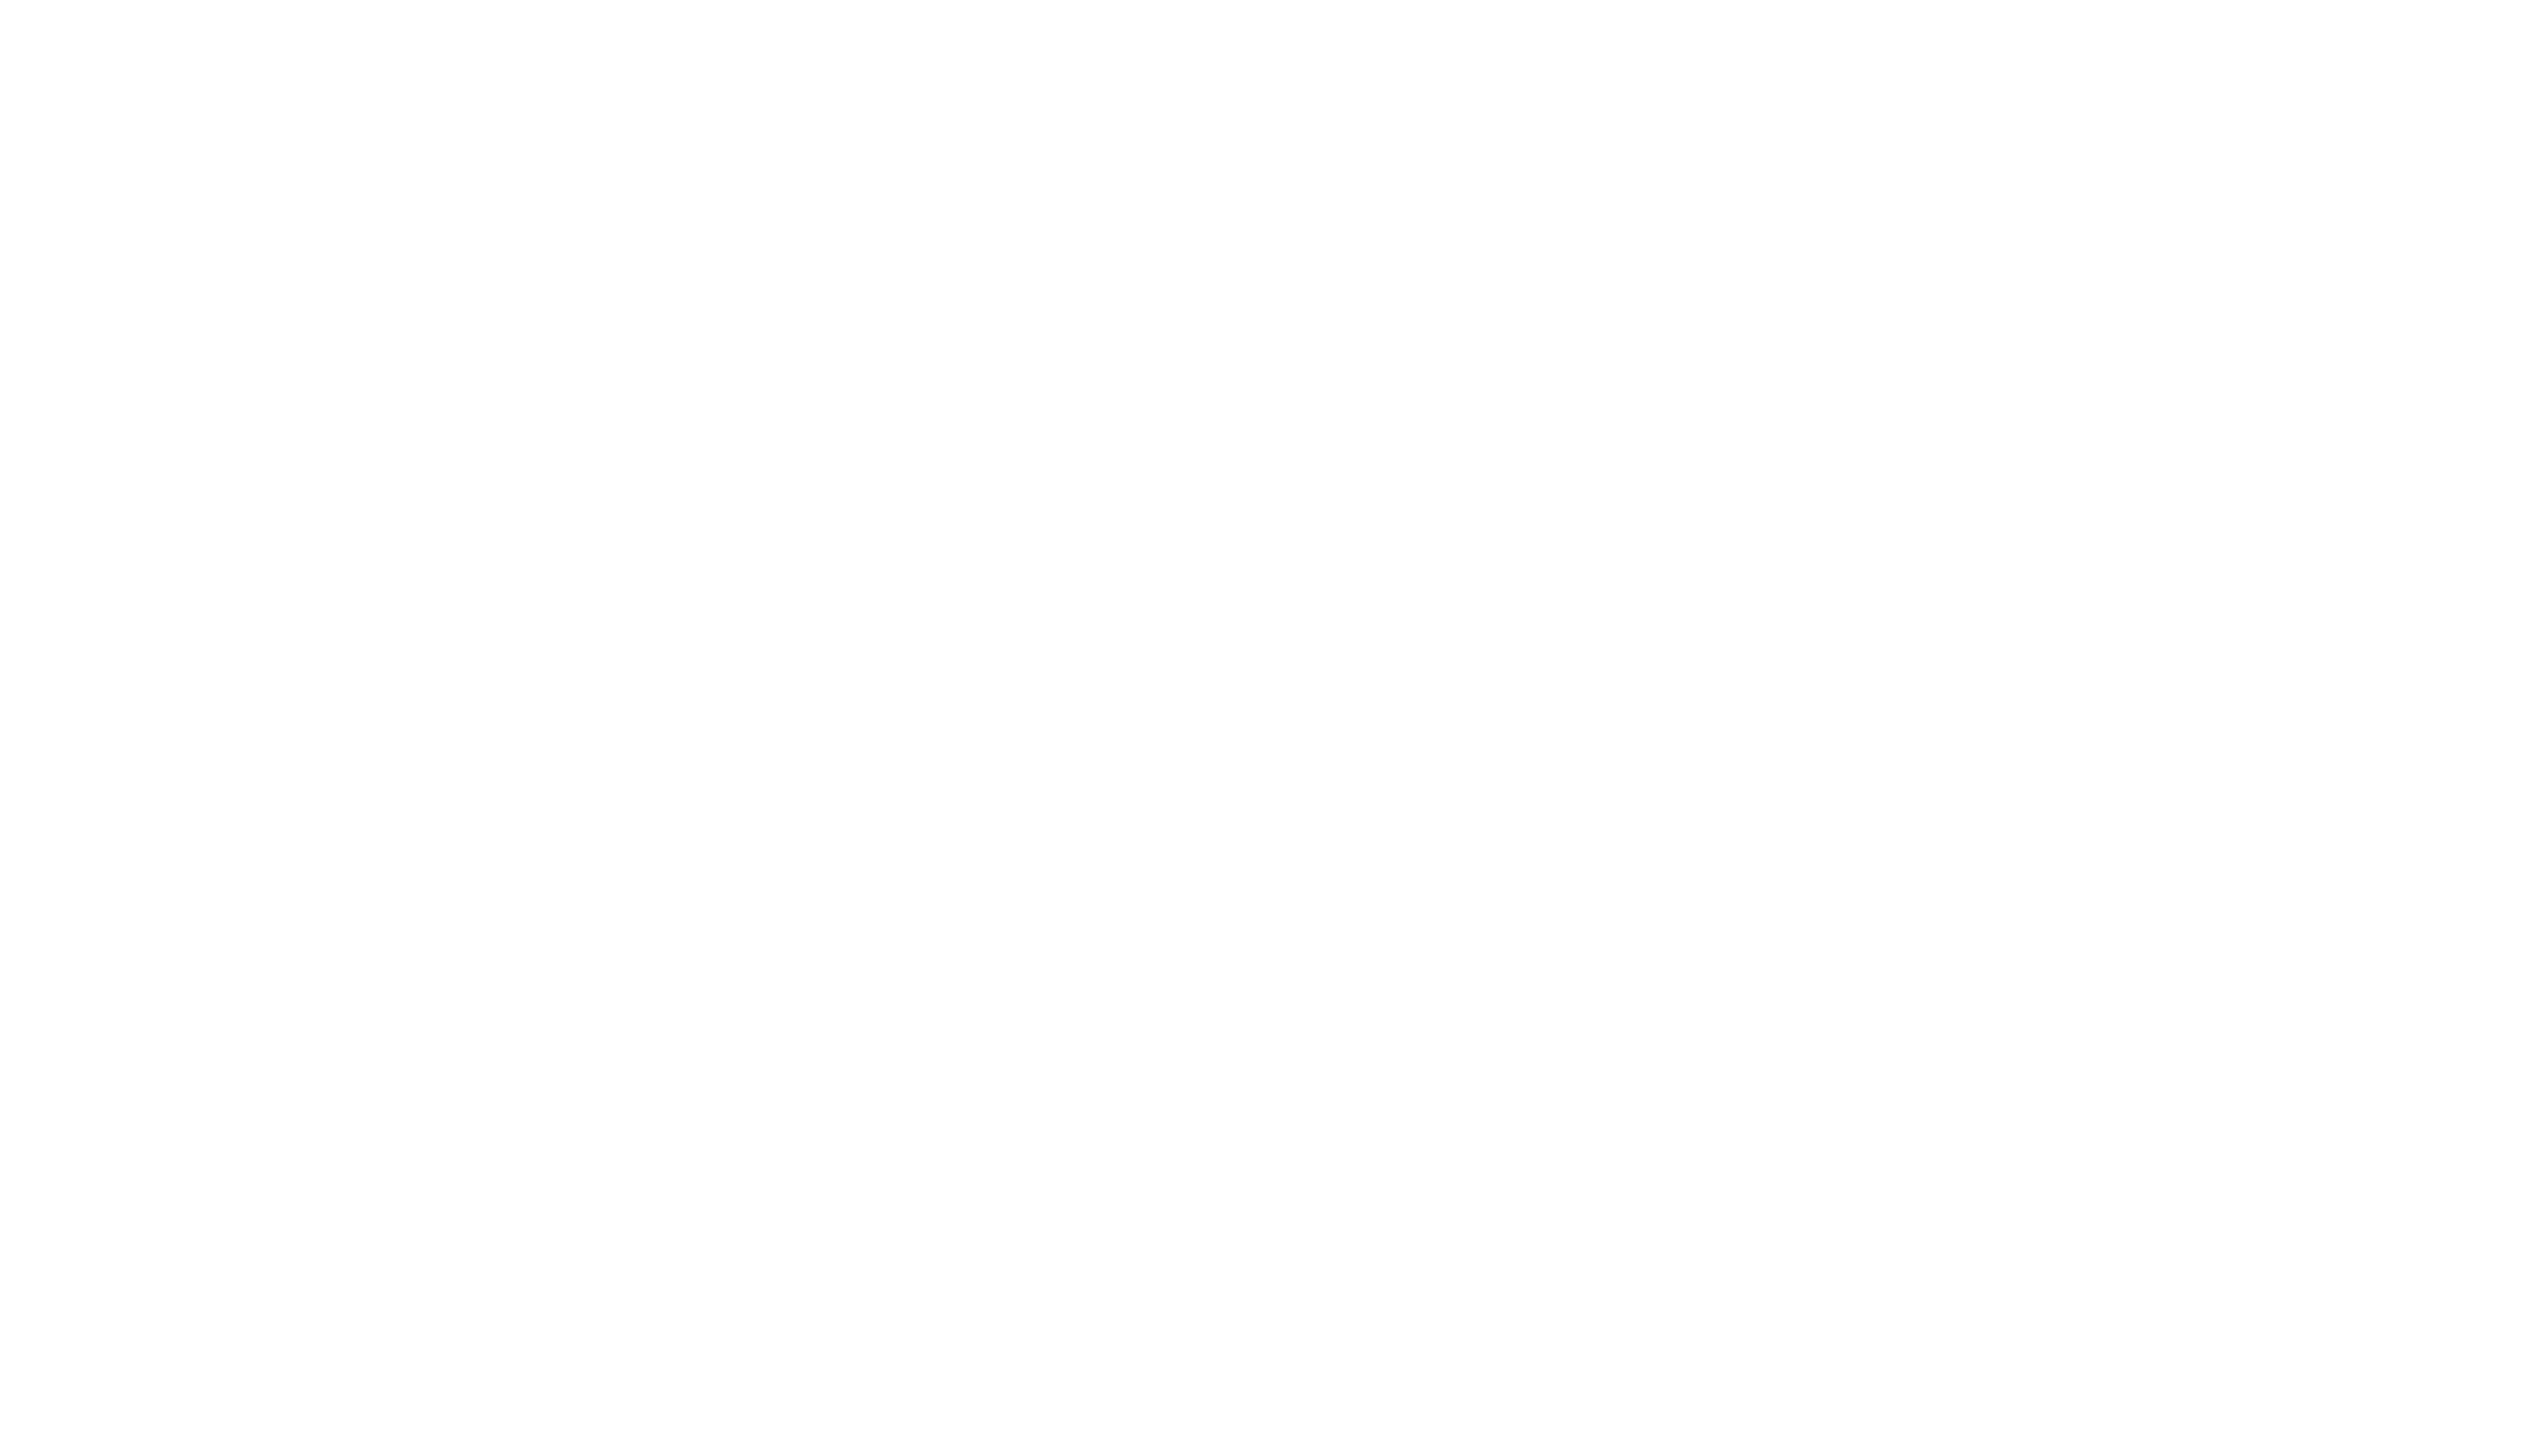 CrossFit Palms